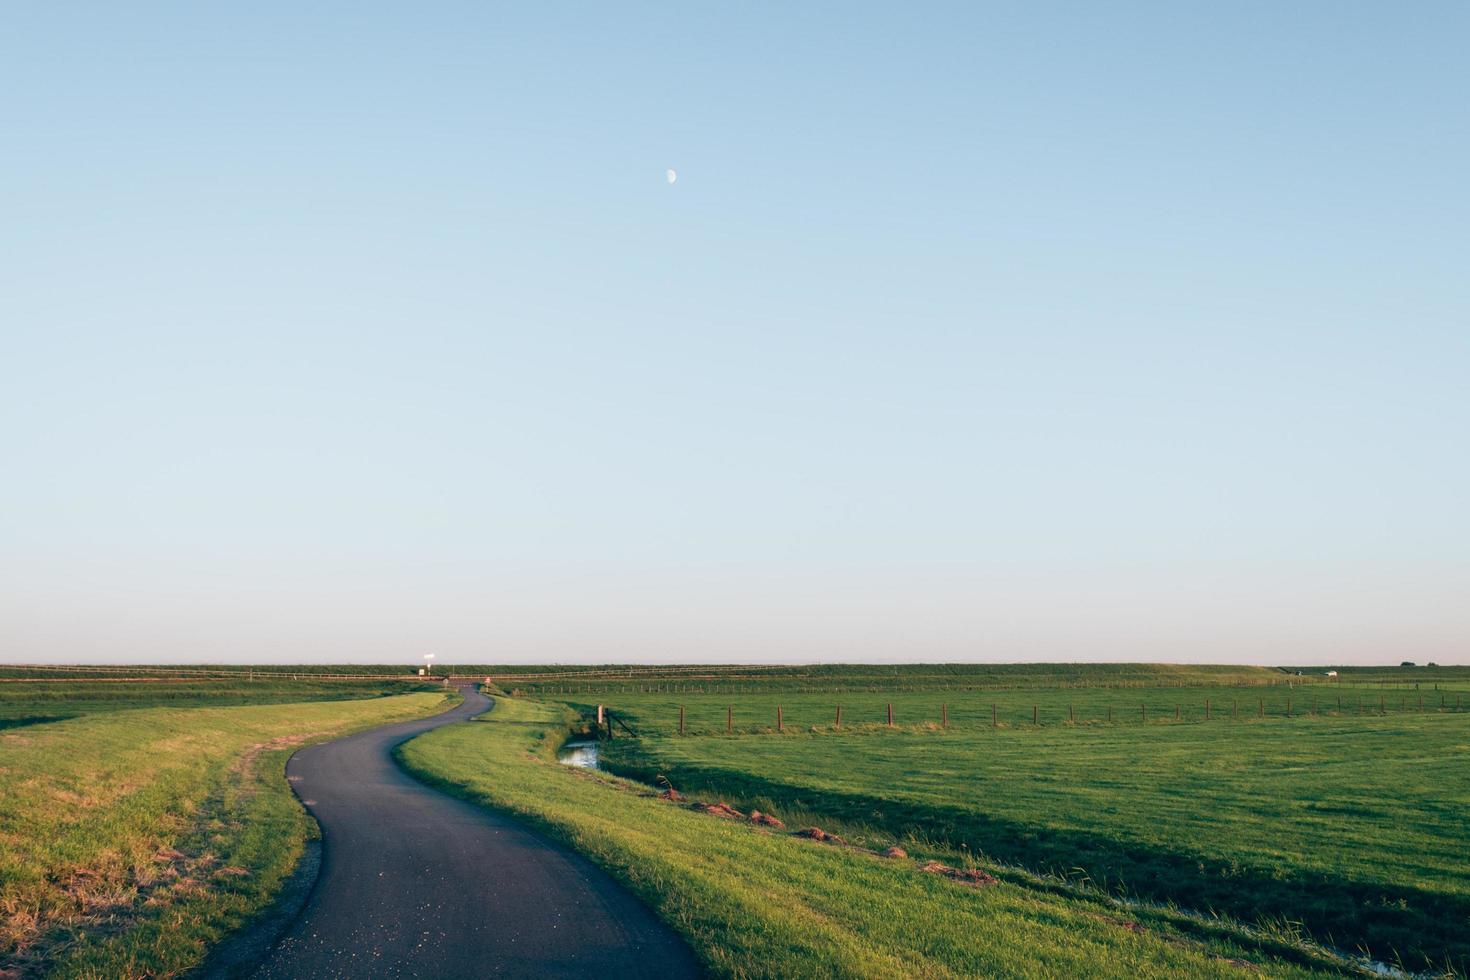 strada tra verdi campi erbosi foto